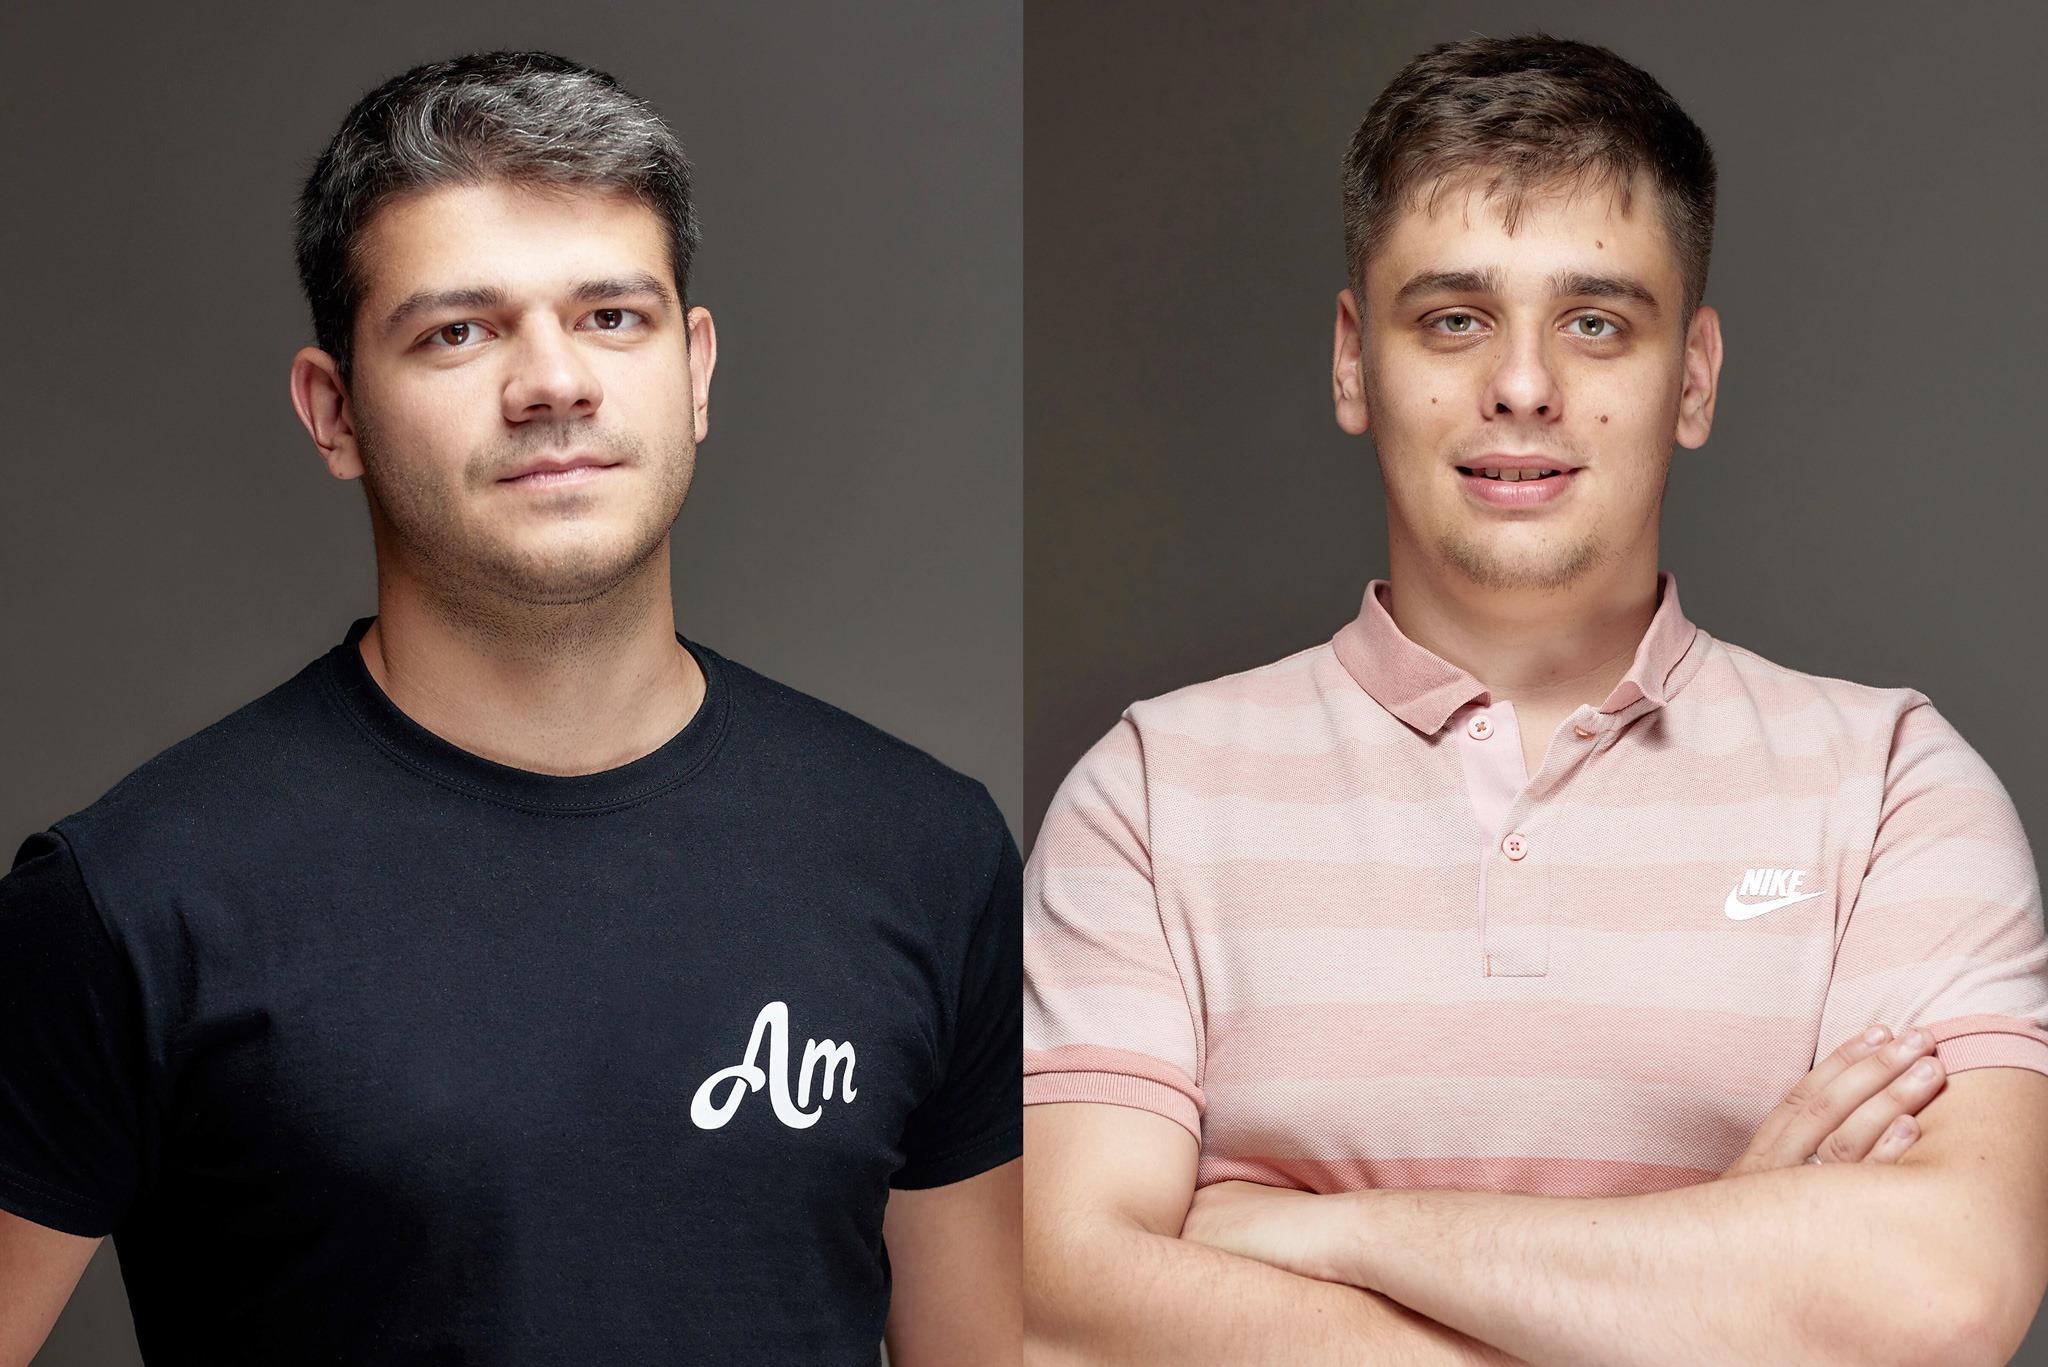 Артур Маркарян и Дмитрий Смирнов, CEO и сооснователи AmoMedia, фото - личный архив AmoMedia